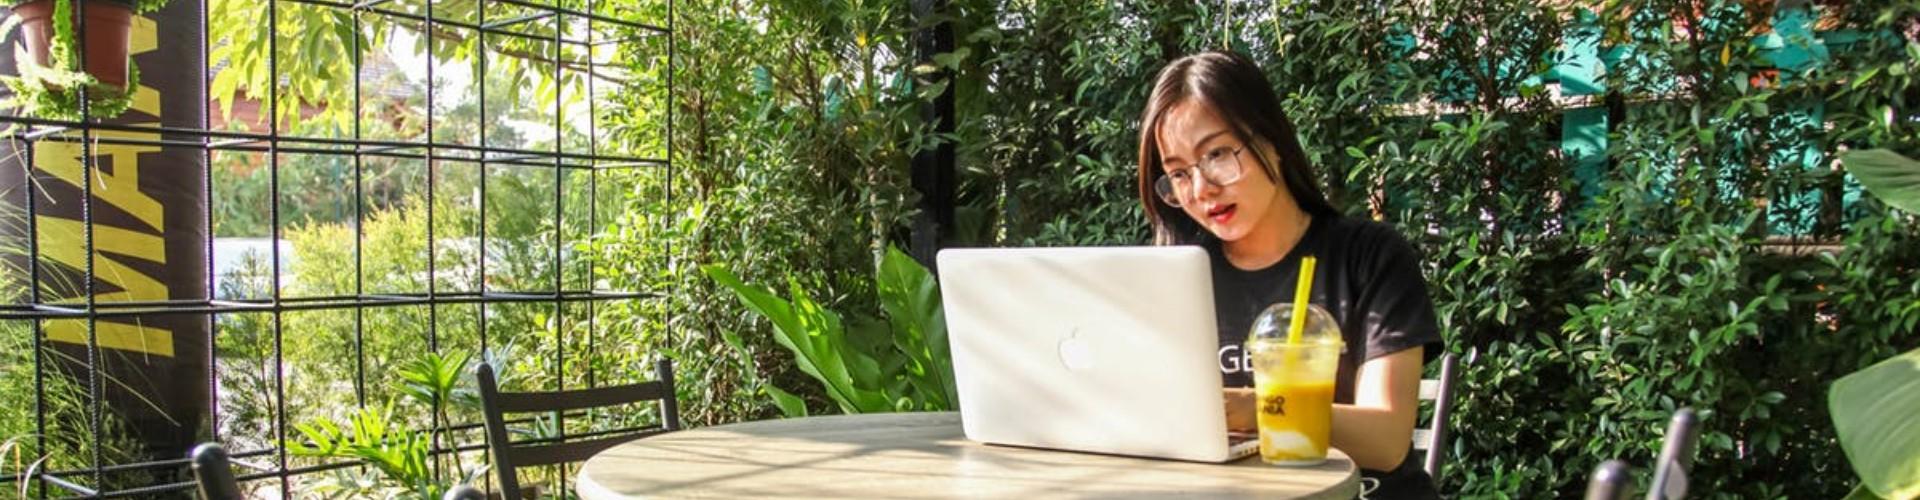 Perfil Profesional en el Currículum: ejemplos, consejos e ideas